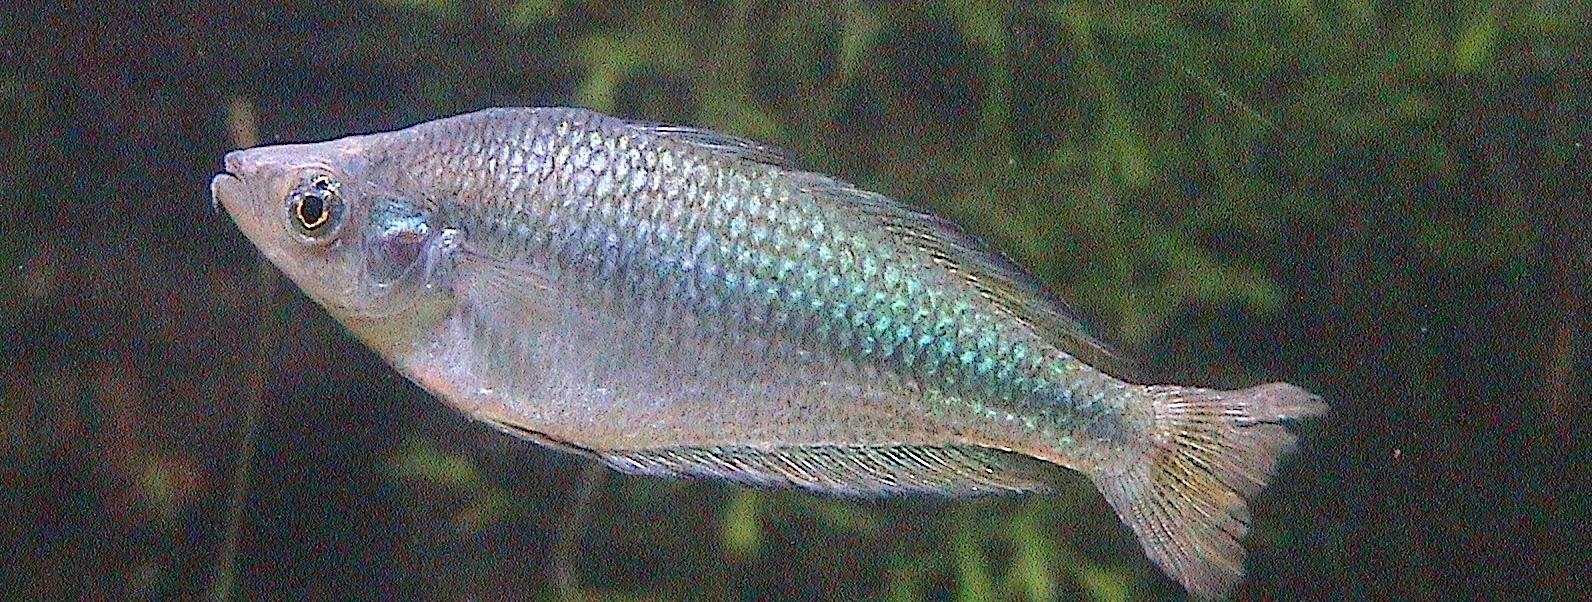 Freshwater Frenzy 10 Facts About Australian Rainbowfish